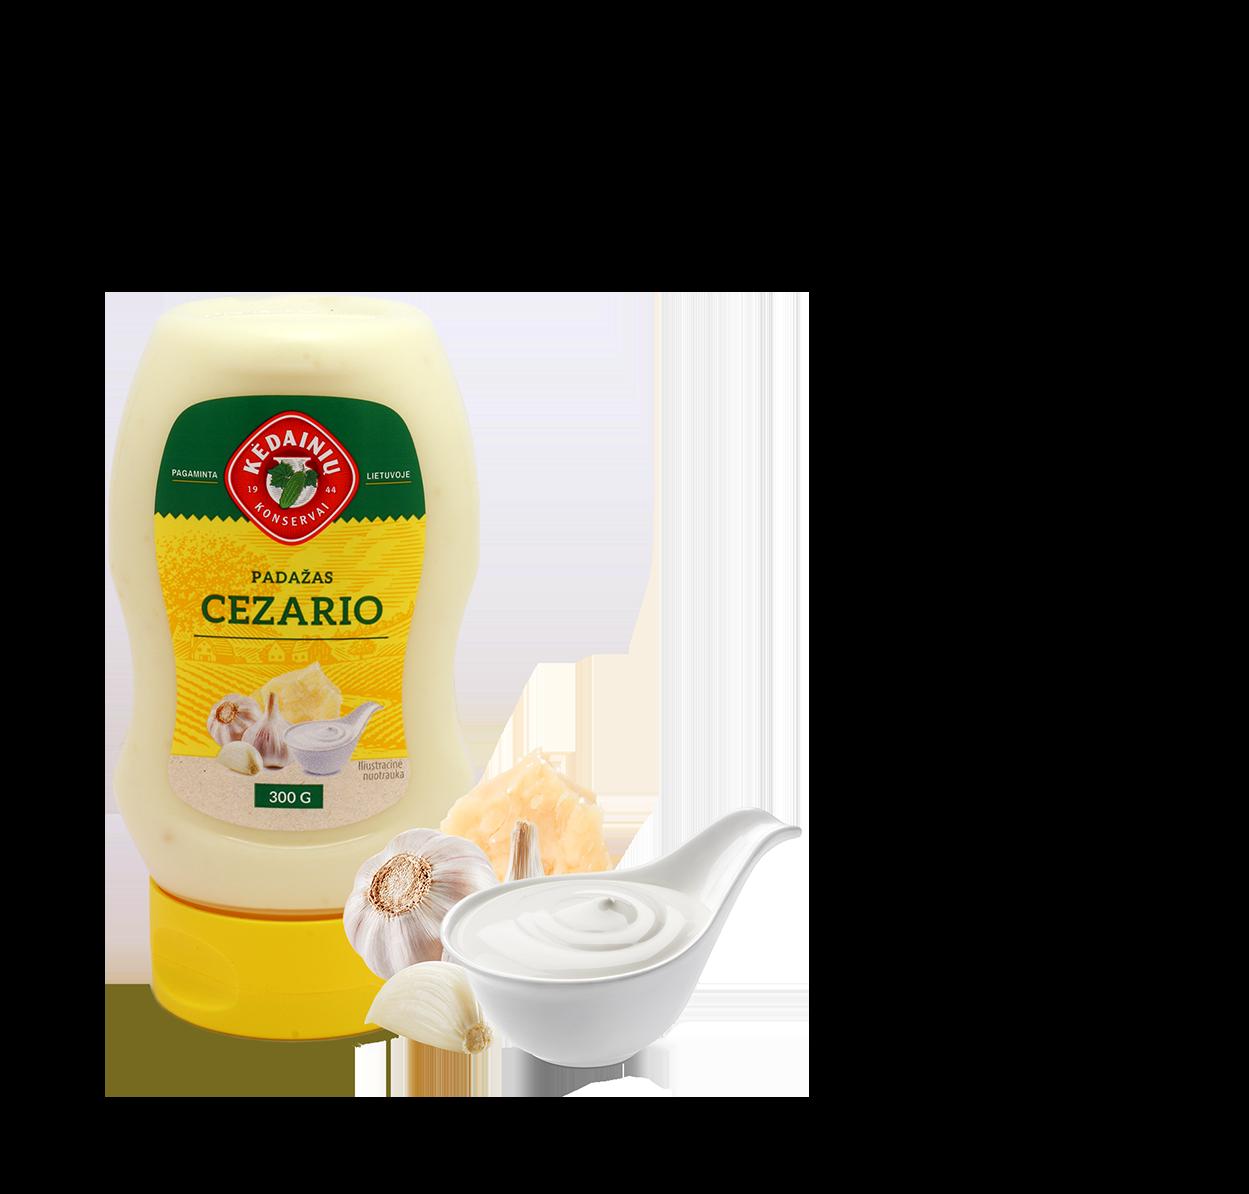 Cezario